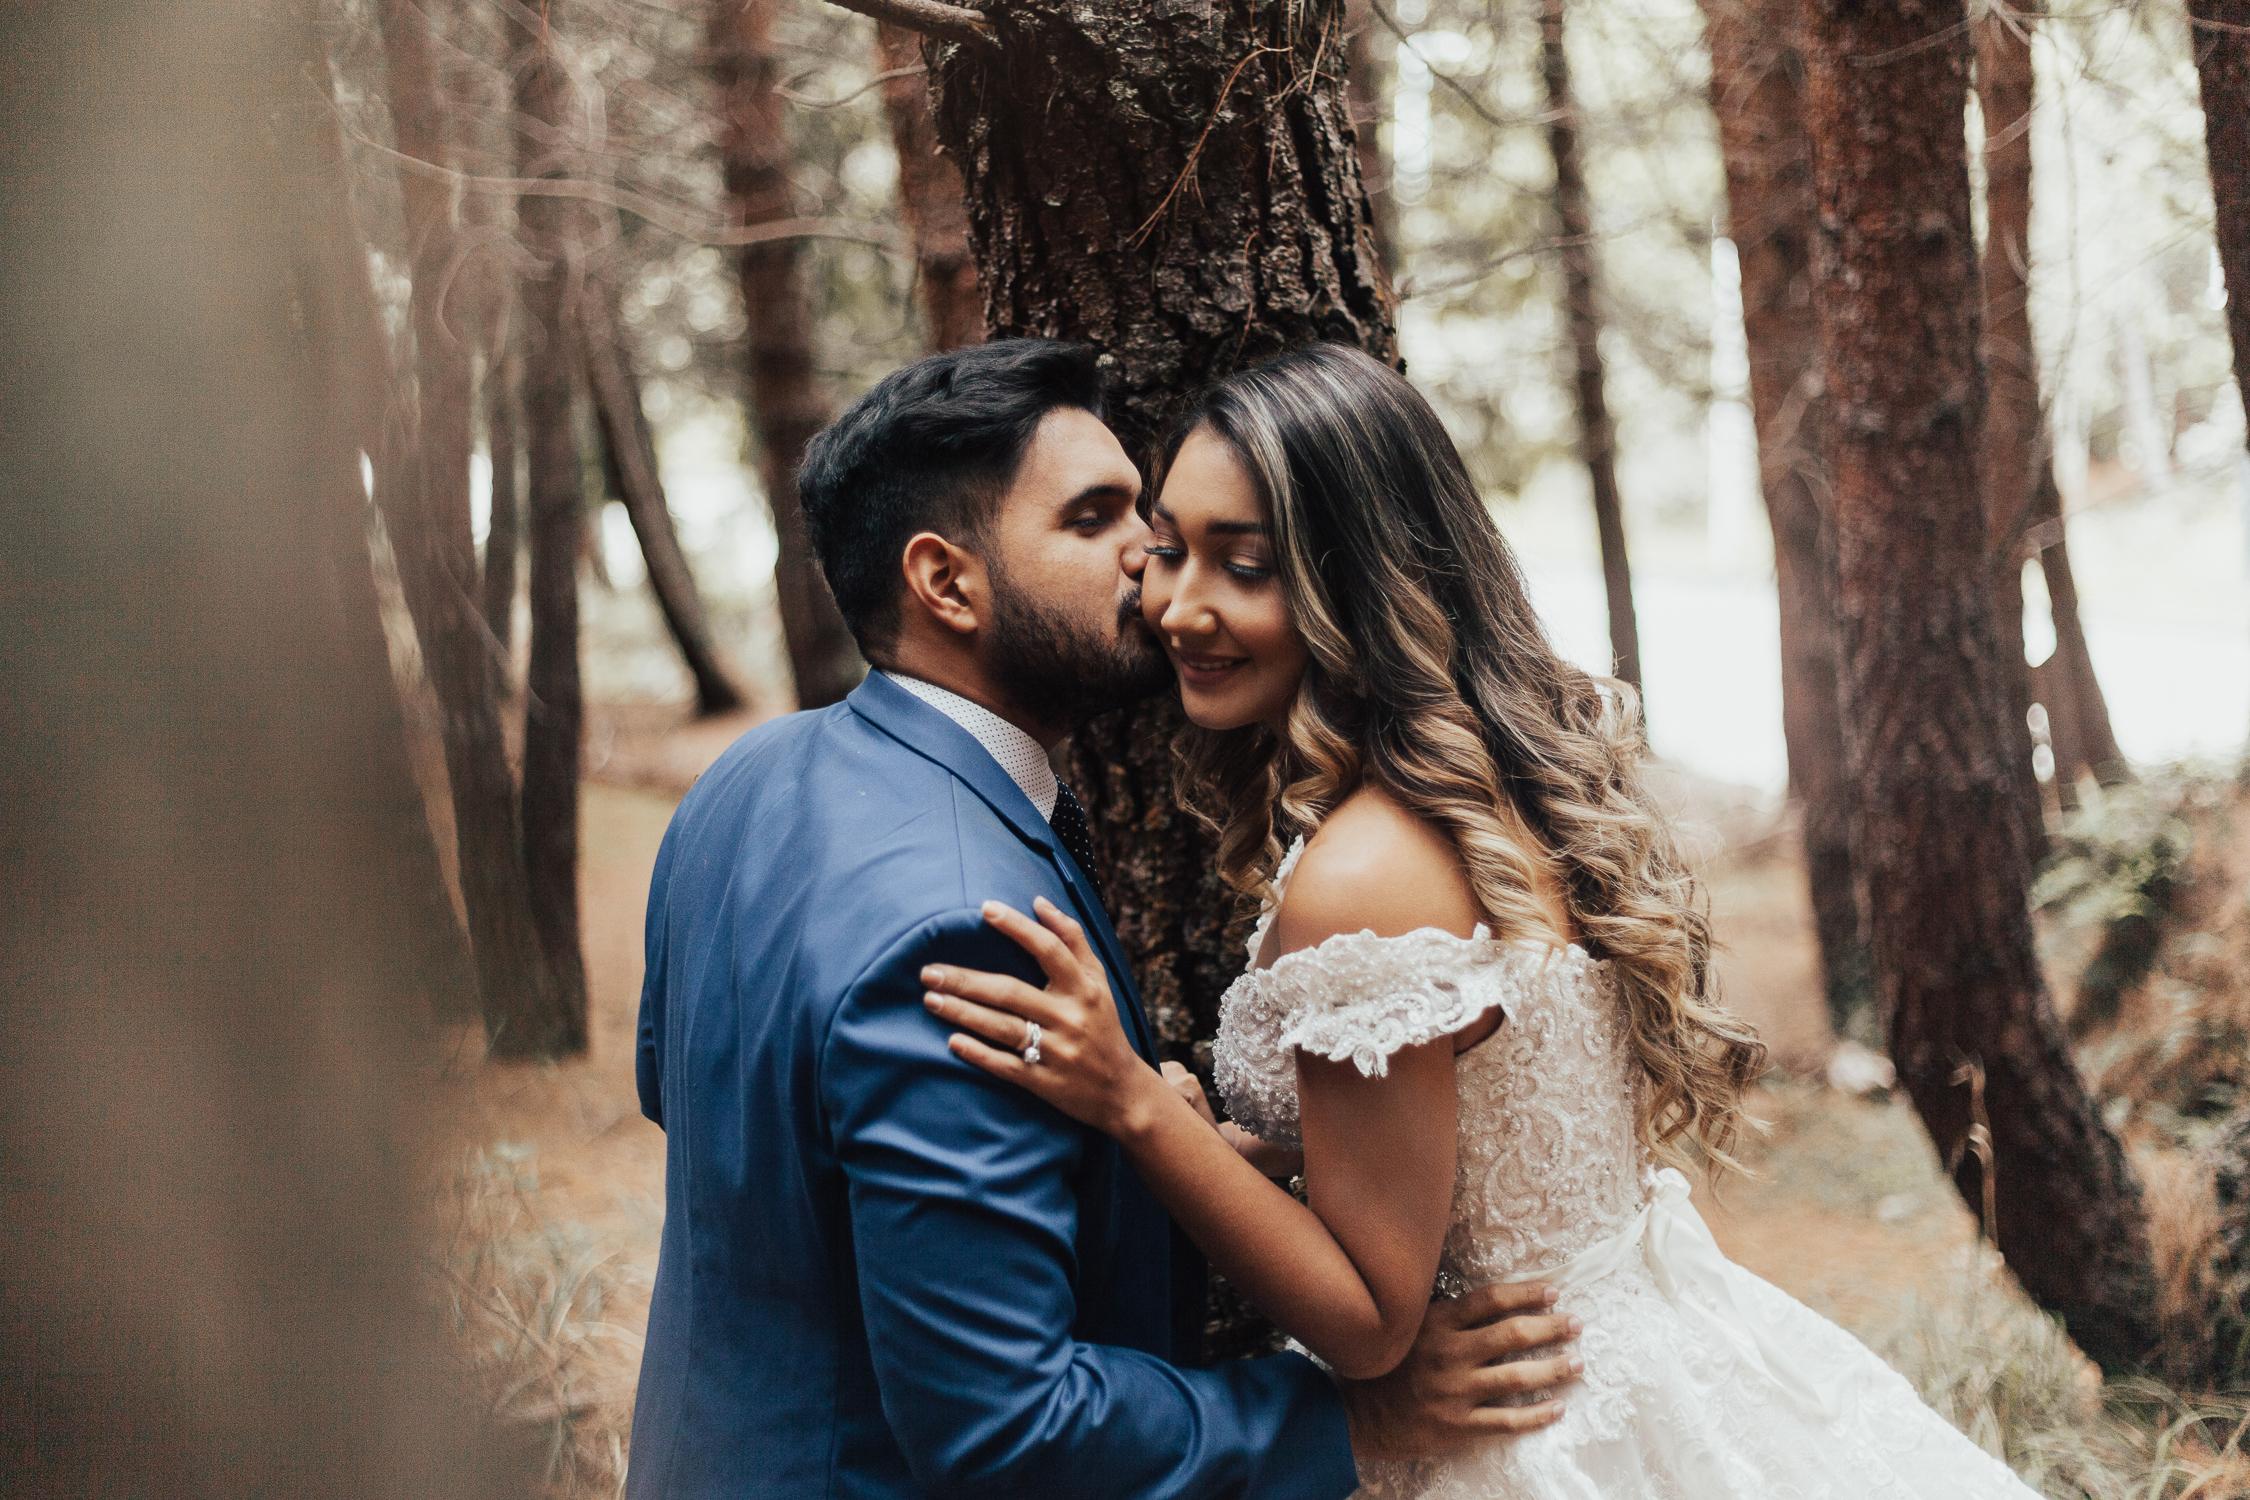 Michelle-Agurto-Fotografia-Bodas-Destination-Wedding-Photographer-Ecuador-Sesion-Johanna-Eduardo-69.JPG